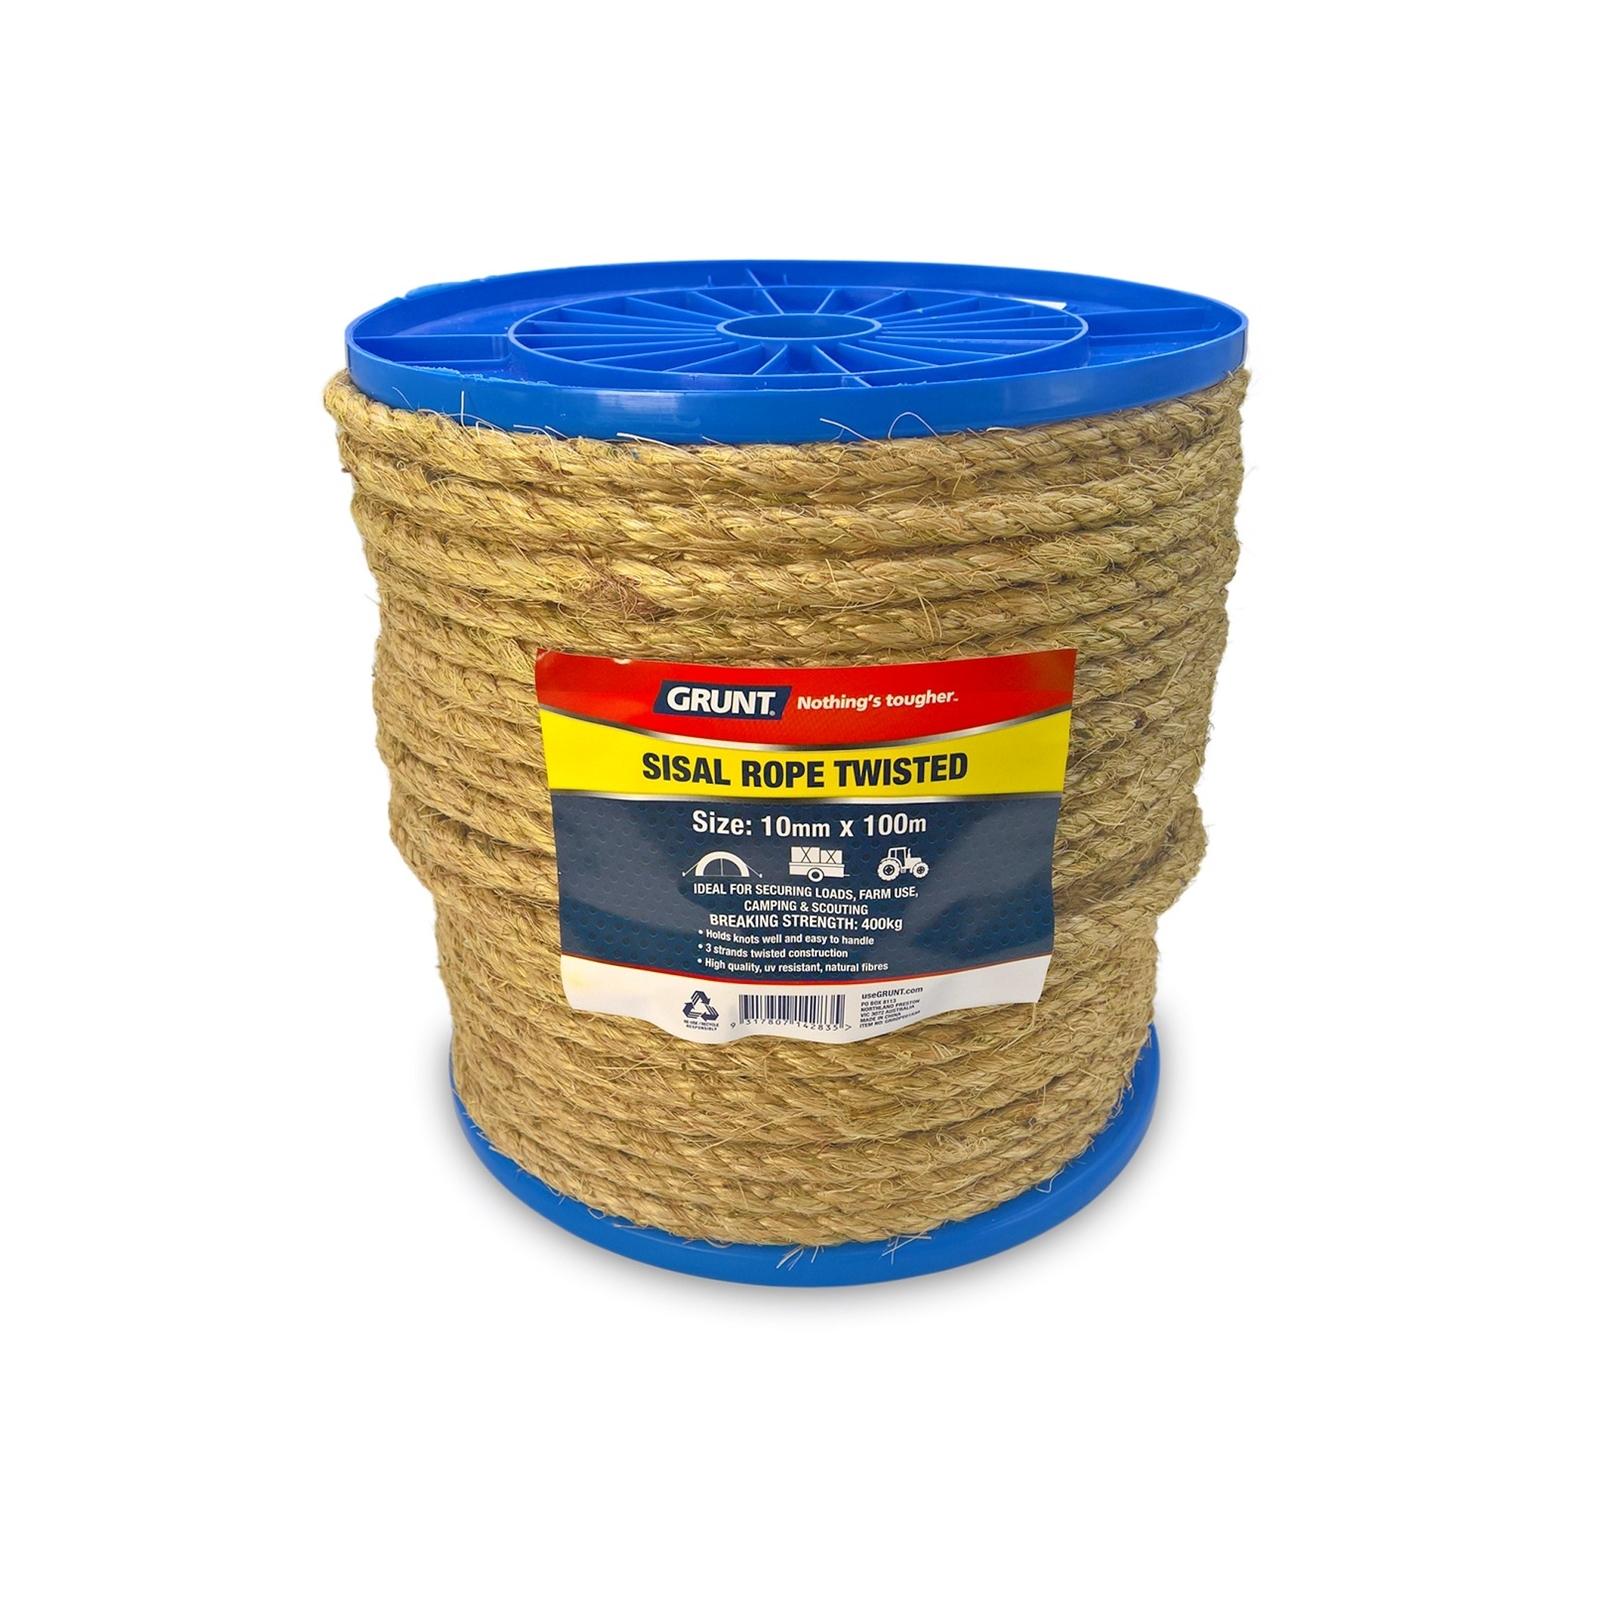 Grunt 10mm x 100m Sisal Twisted Rope